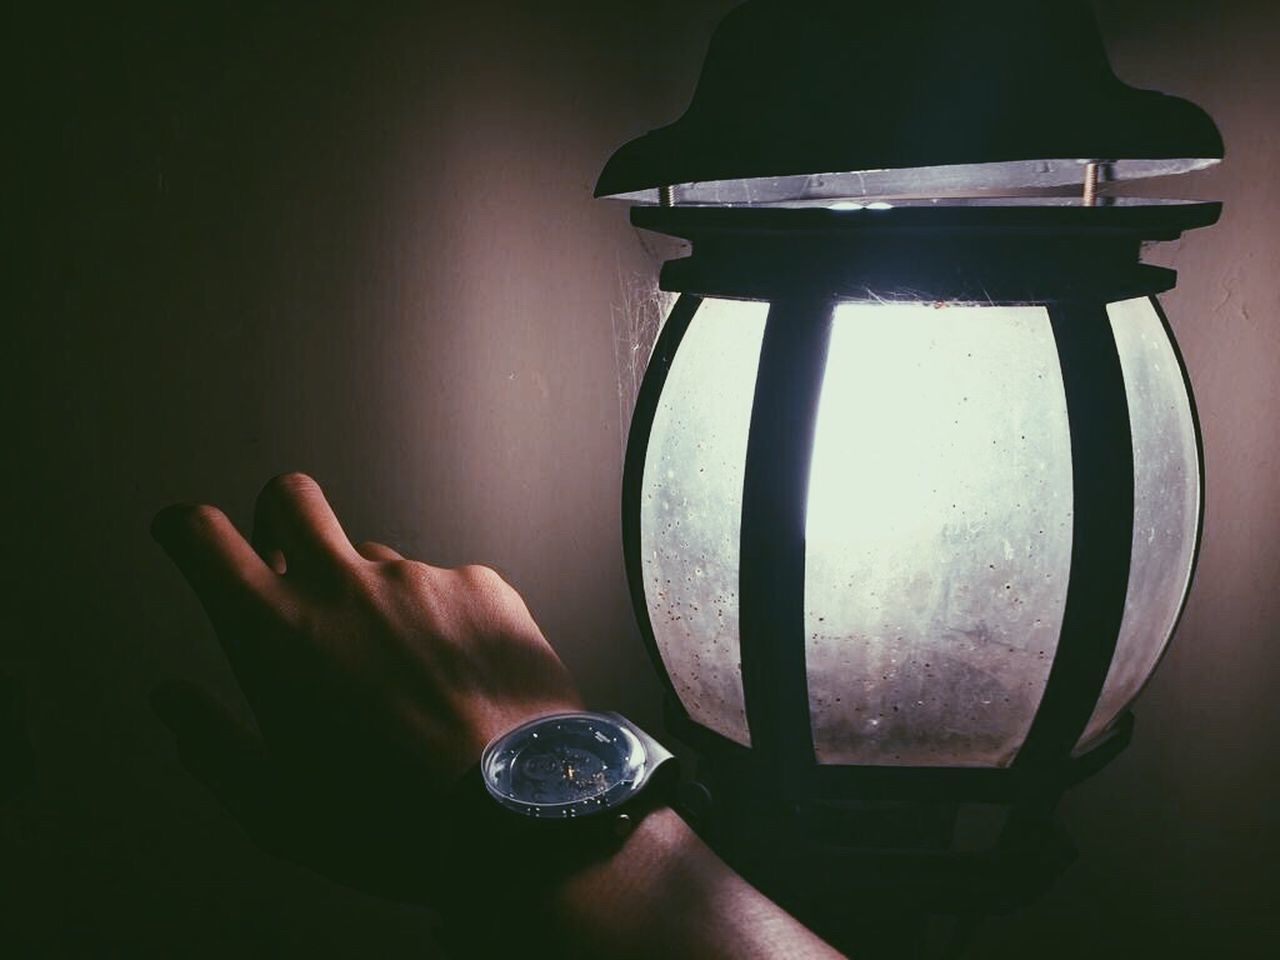 CLOSE-UP OF HAND HOLDING ILLUMINATED ELECTRIC LIGHT